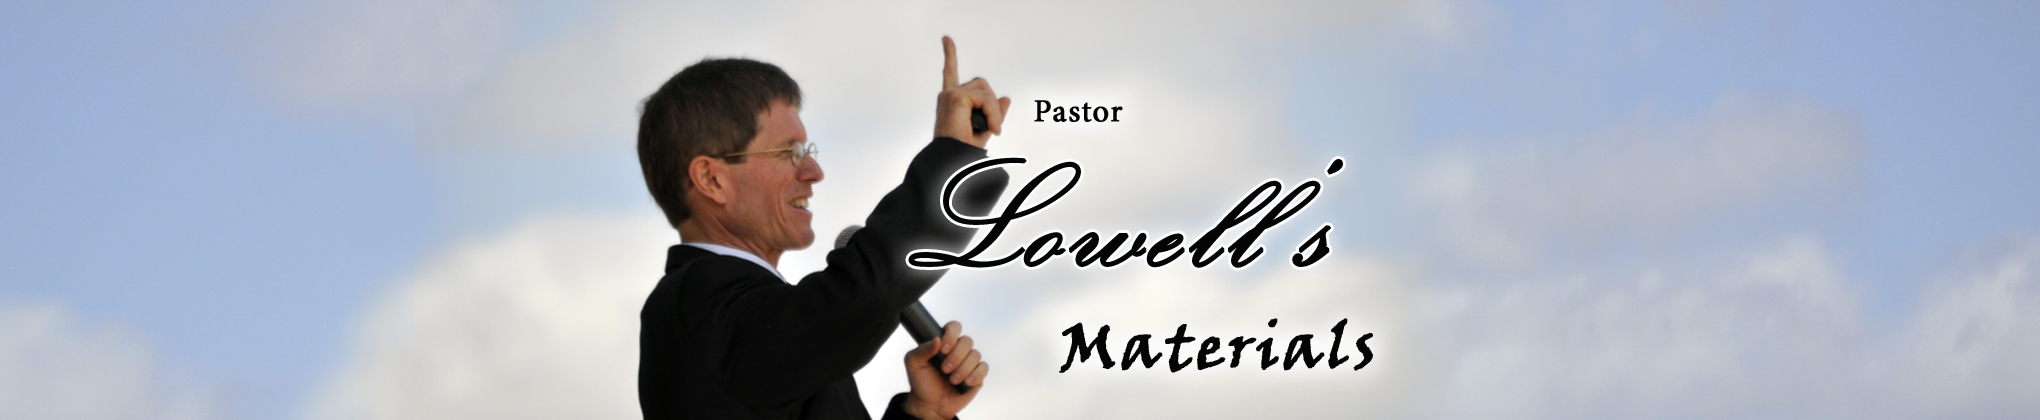 Pastor Lowell's3